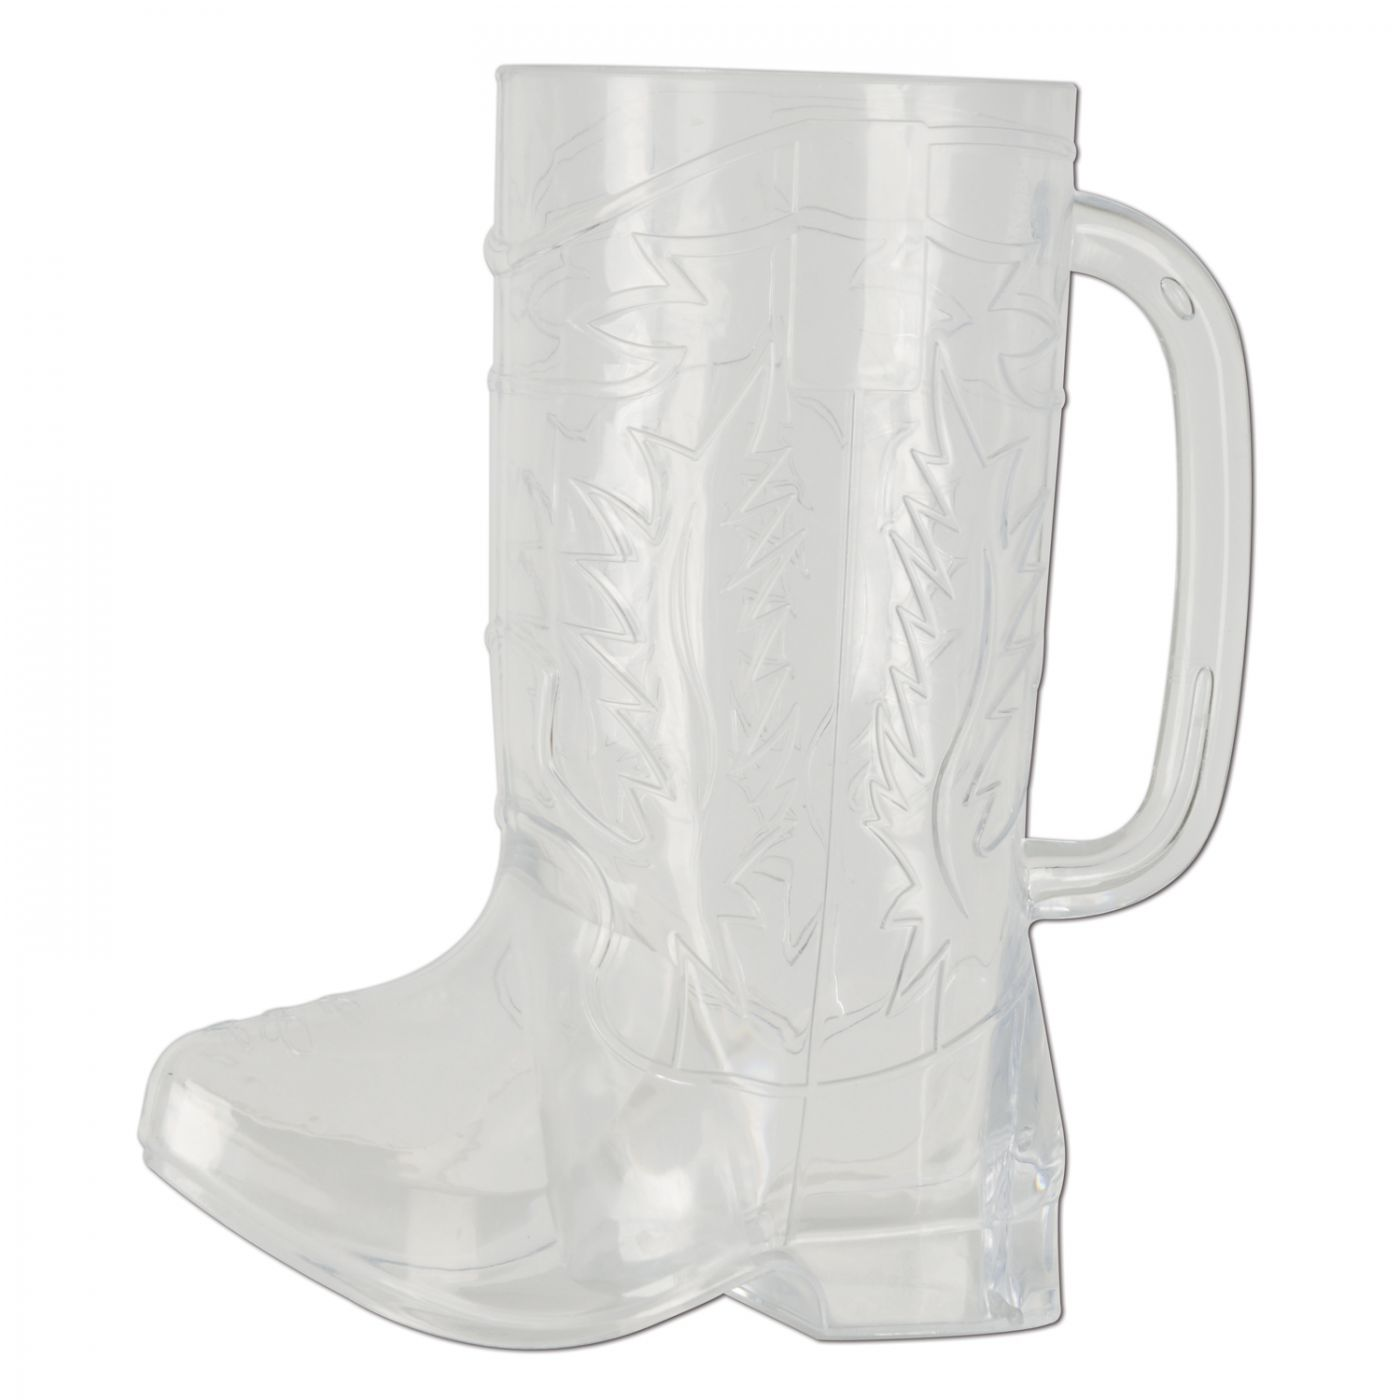 Plastic Cowboy Boot Mug image